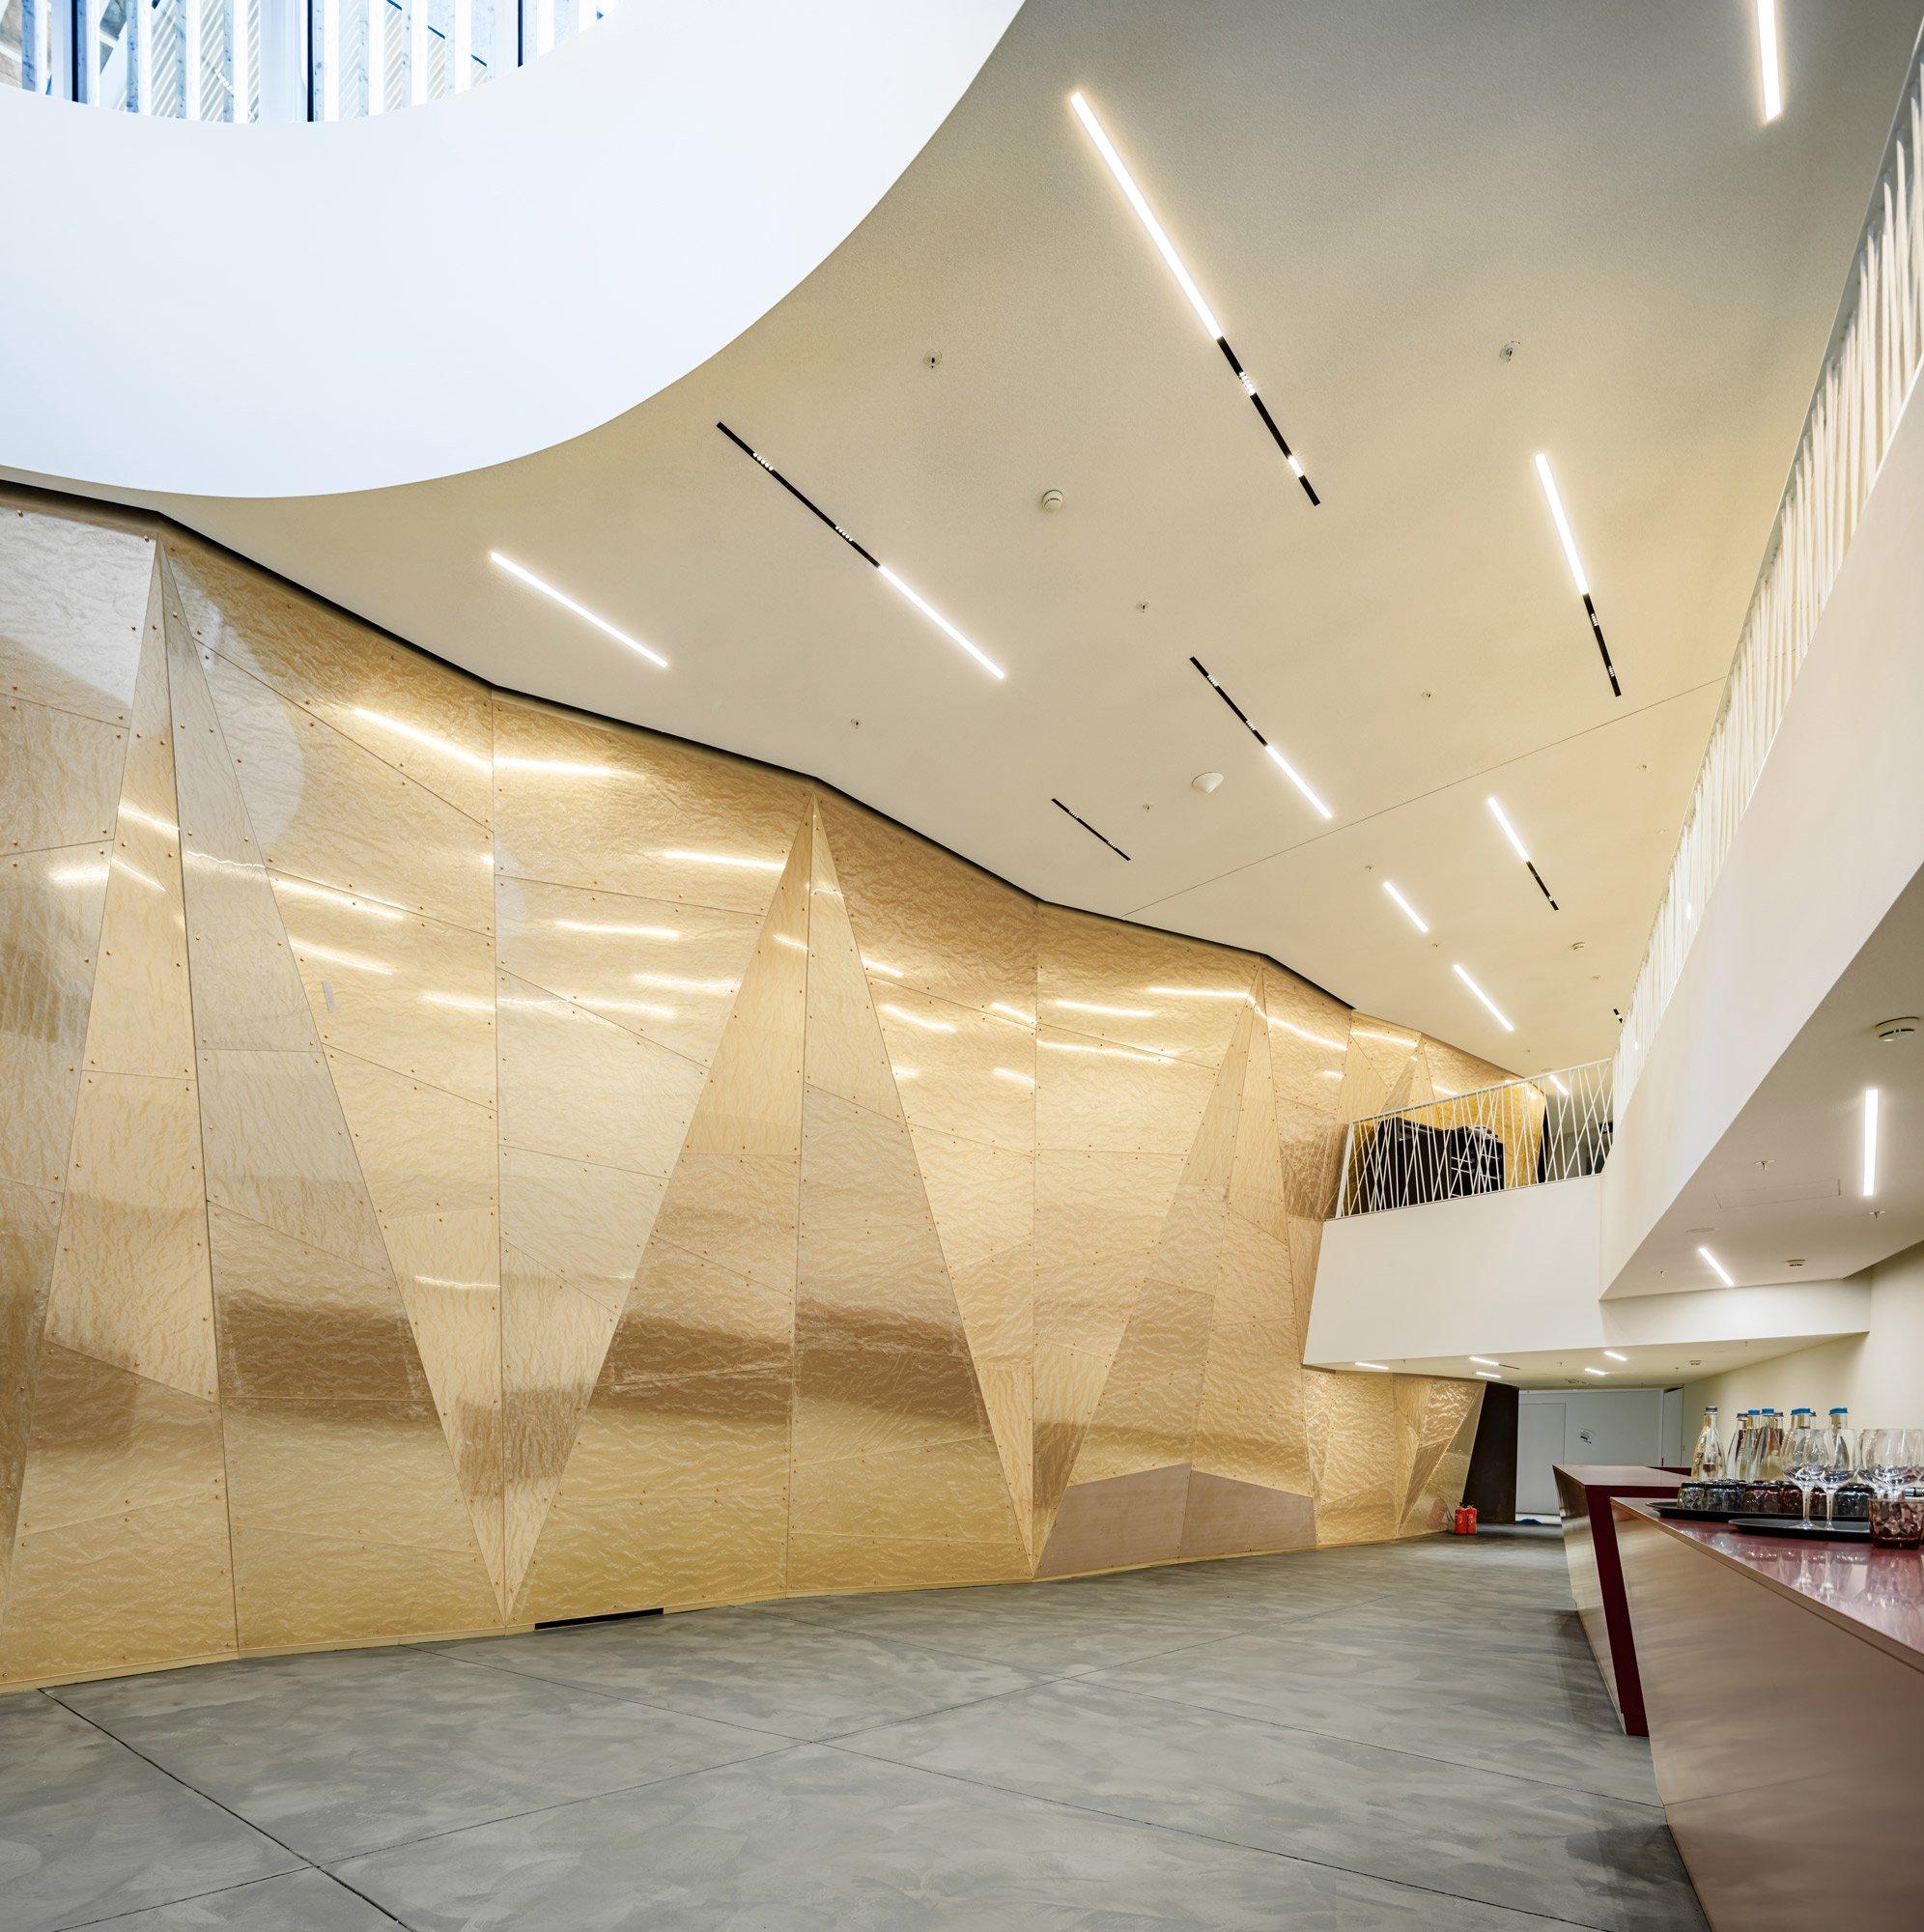 Andermatt Concert Hall © Kanipak Photography